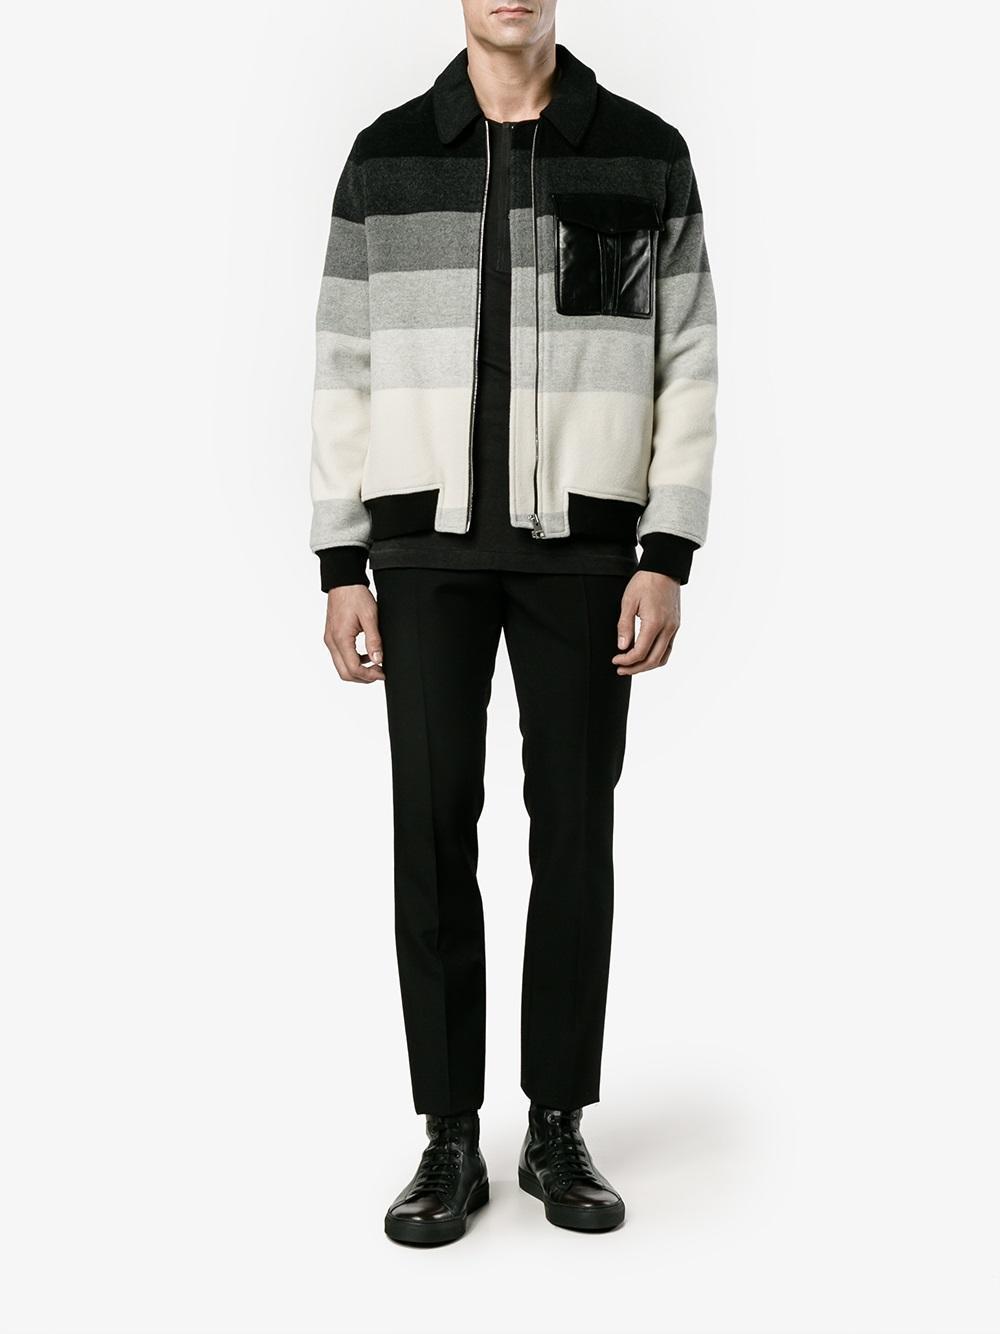 JW Anderson Wool Striped Bomber Jacket in Black (Natural) for Men